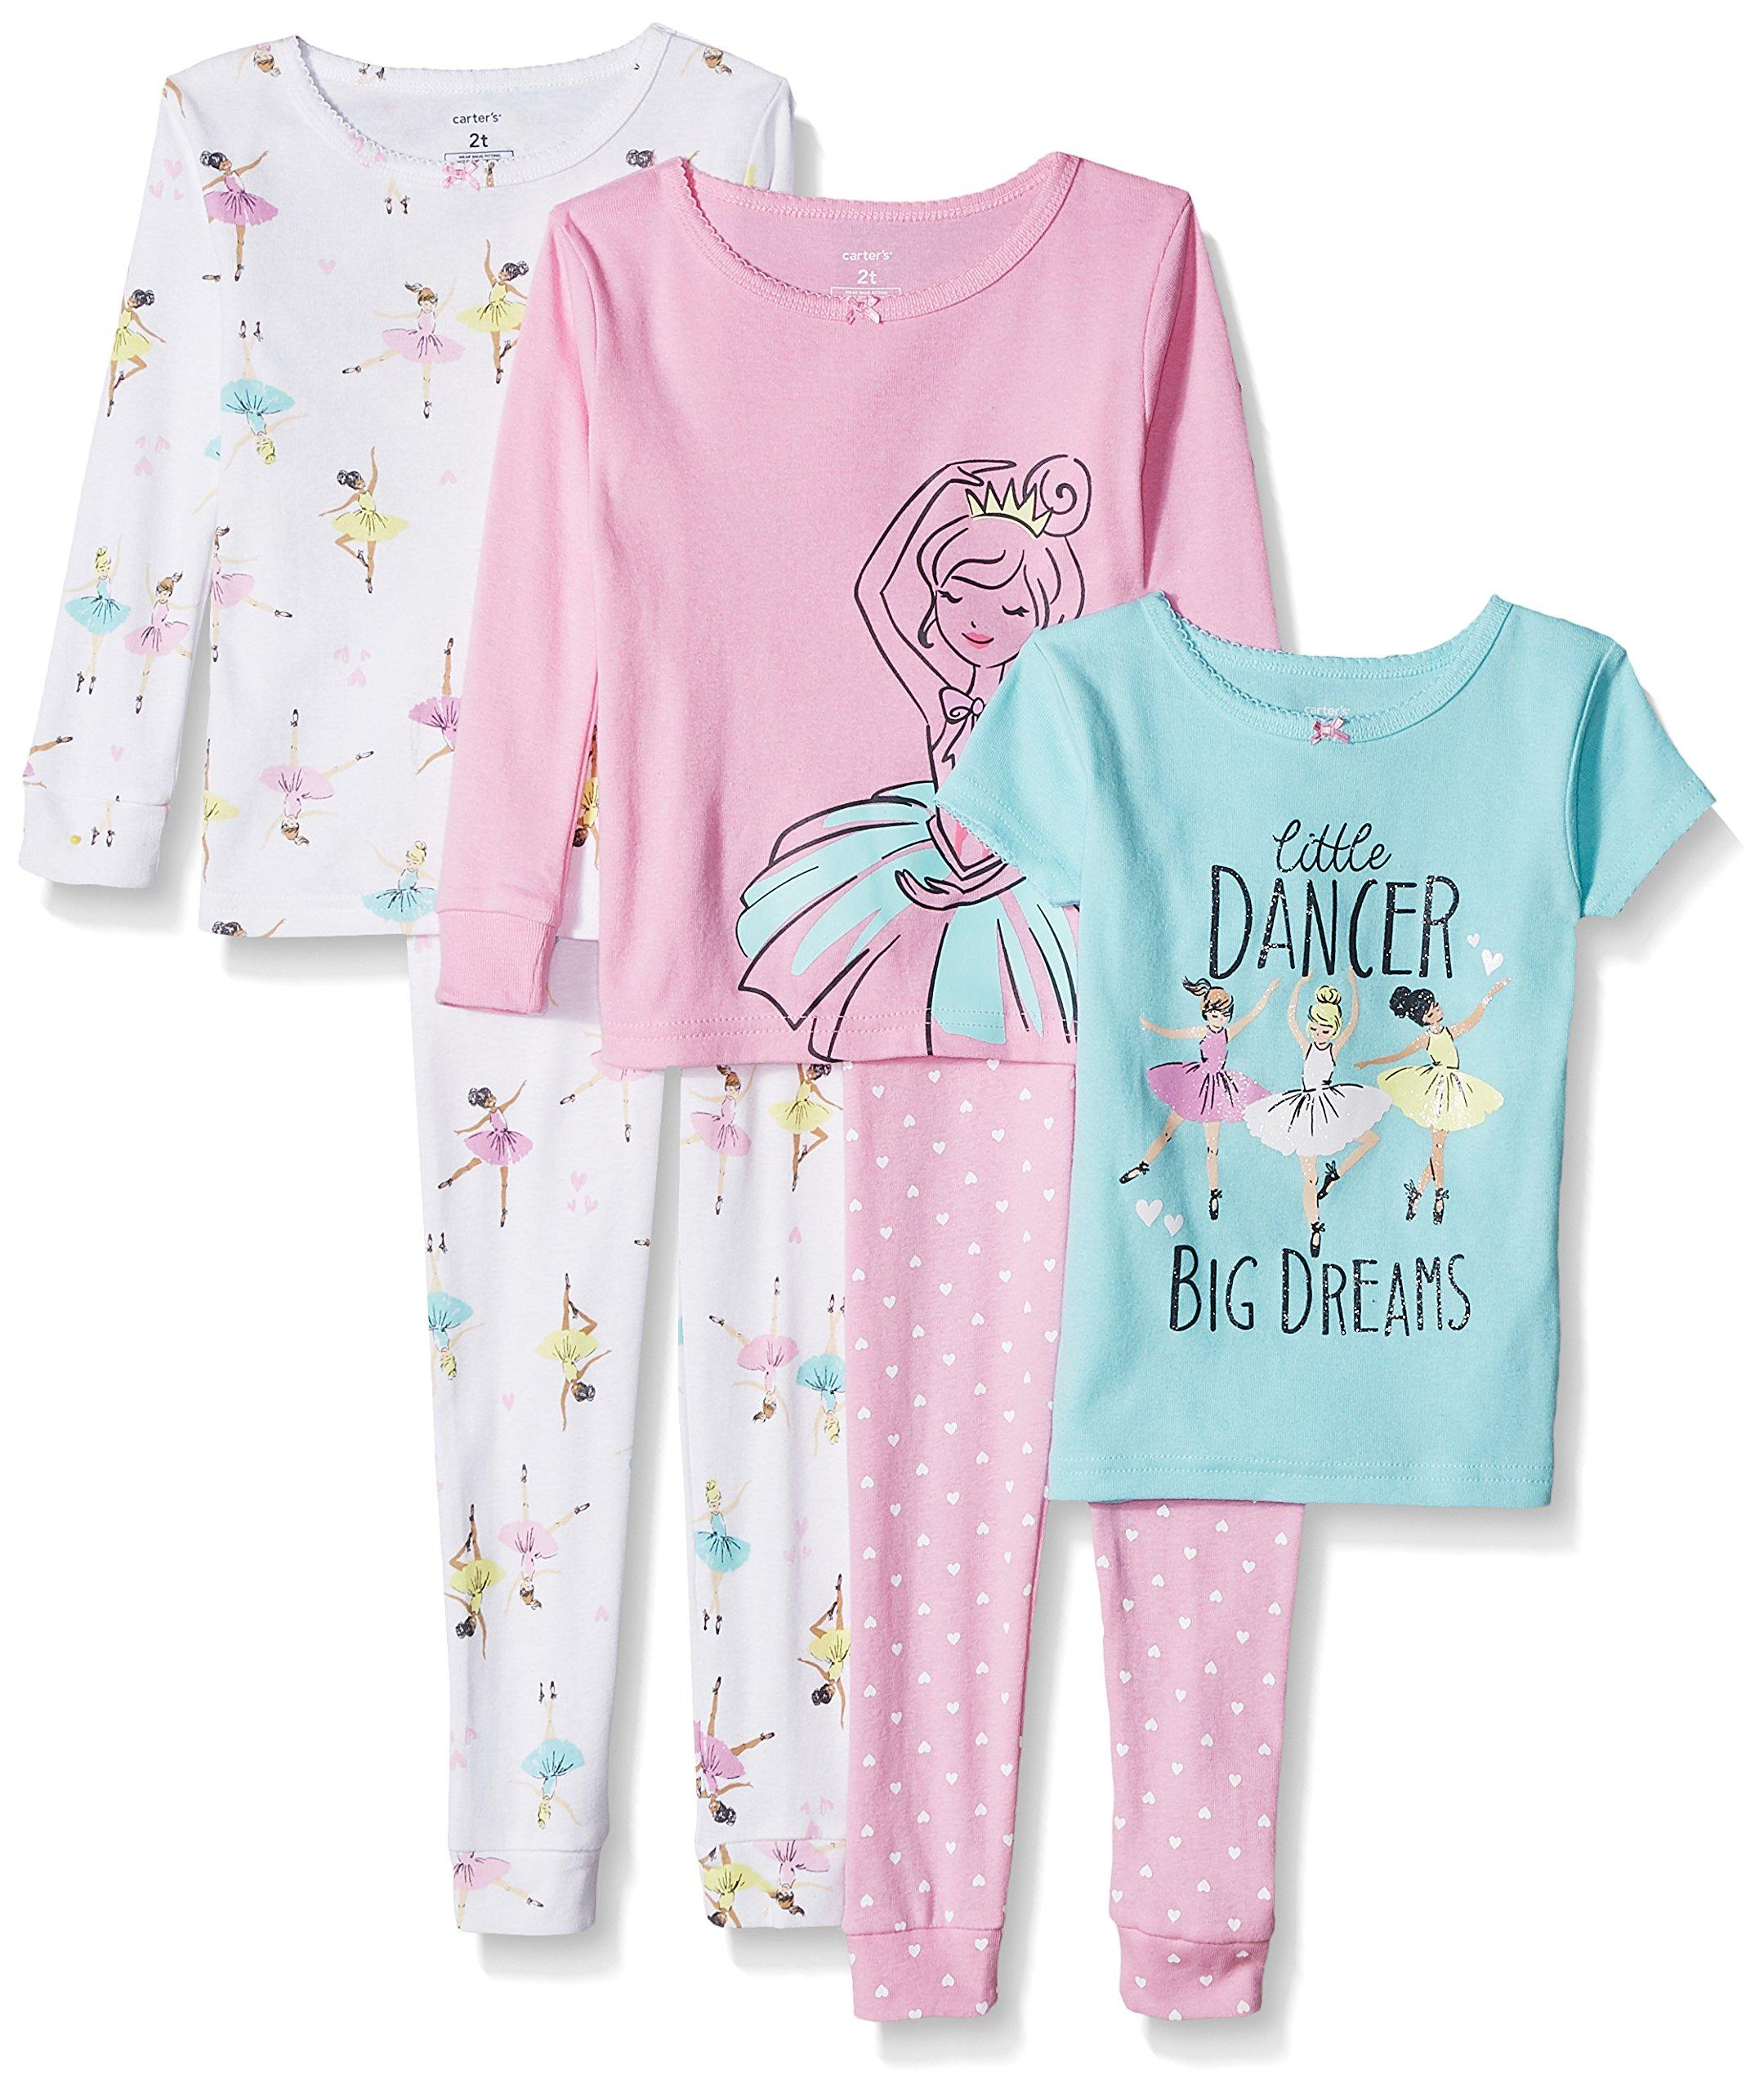 Carter's Girls' Toddler 5-Piece Cotton Snug-Fit